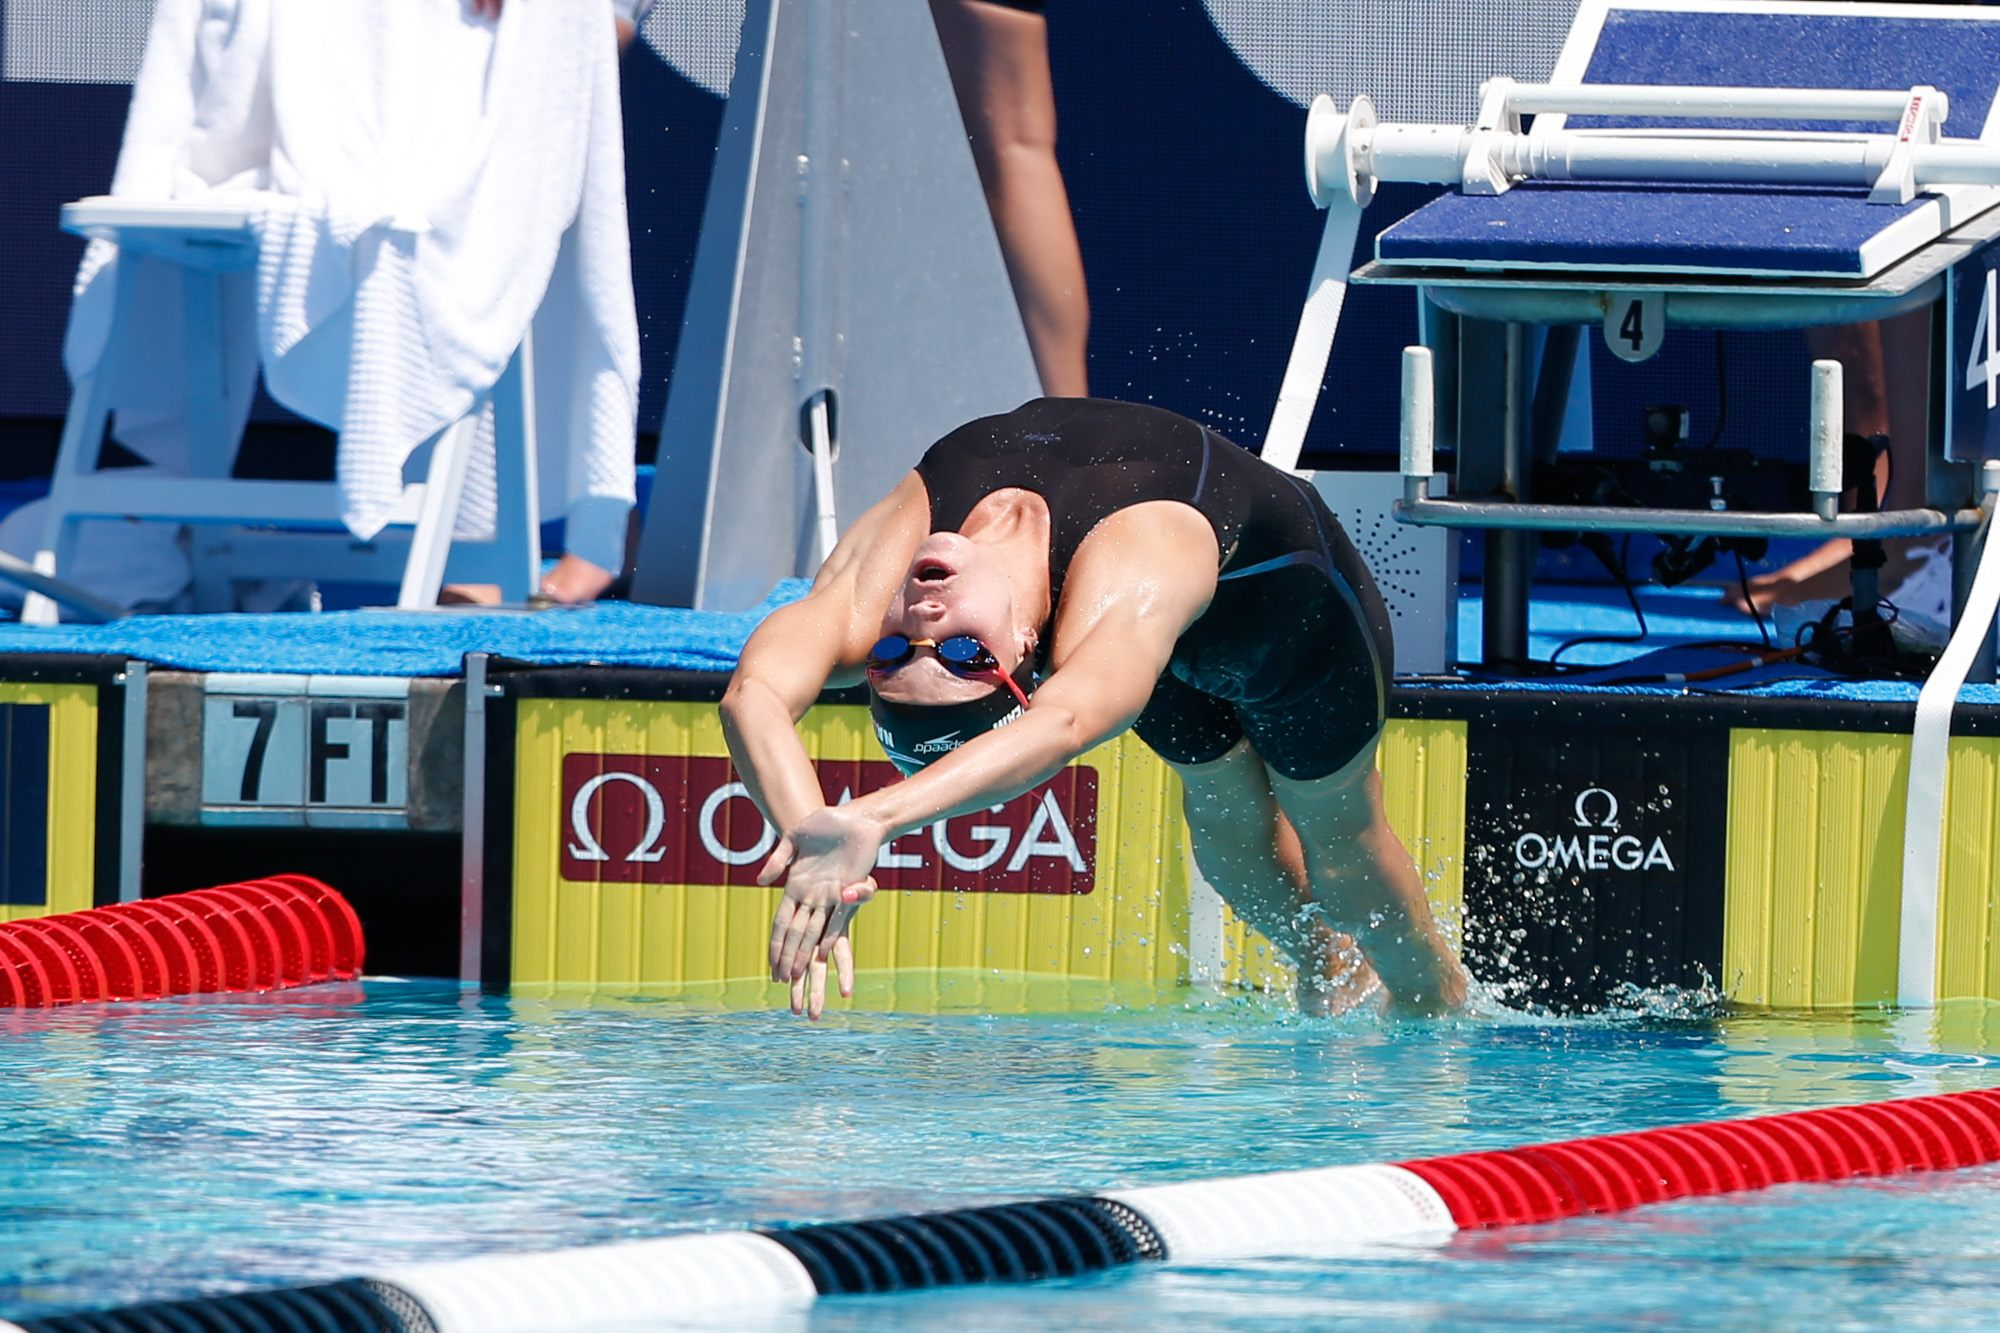 Wwwnudegirl Com Girl Blows College Swimmer